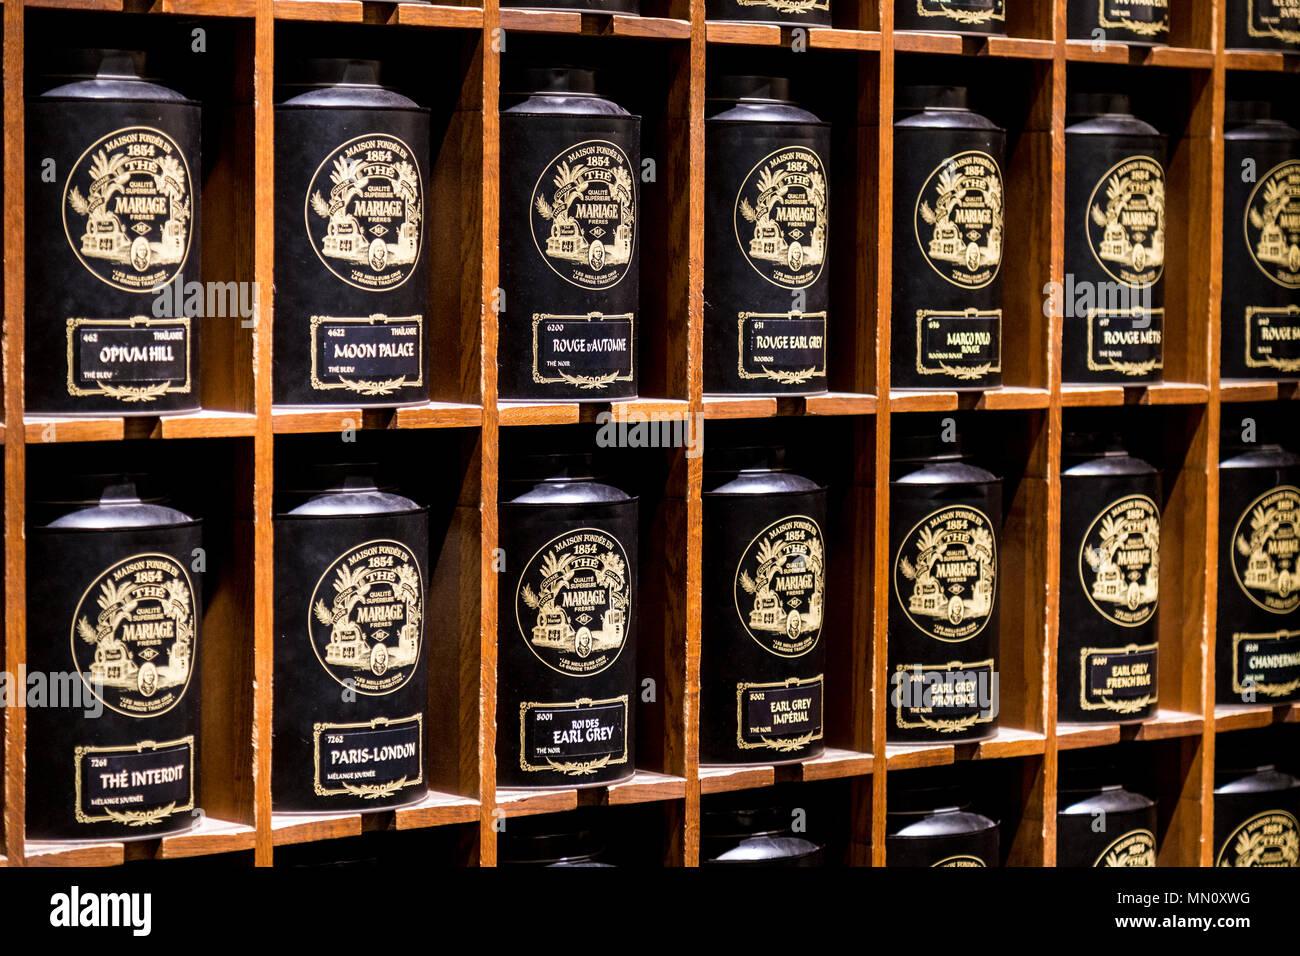 Large tea canisters at French tea Mariage Freres shop inside Selfridges, London, UK - Stock Image